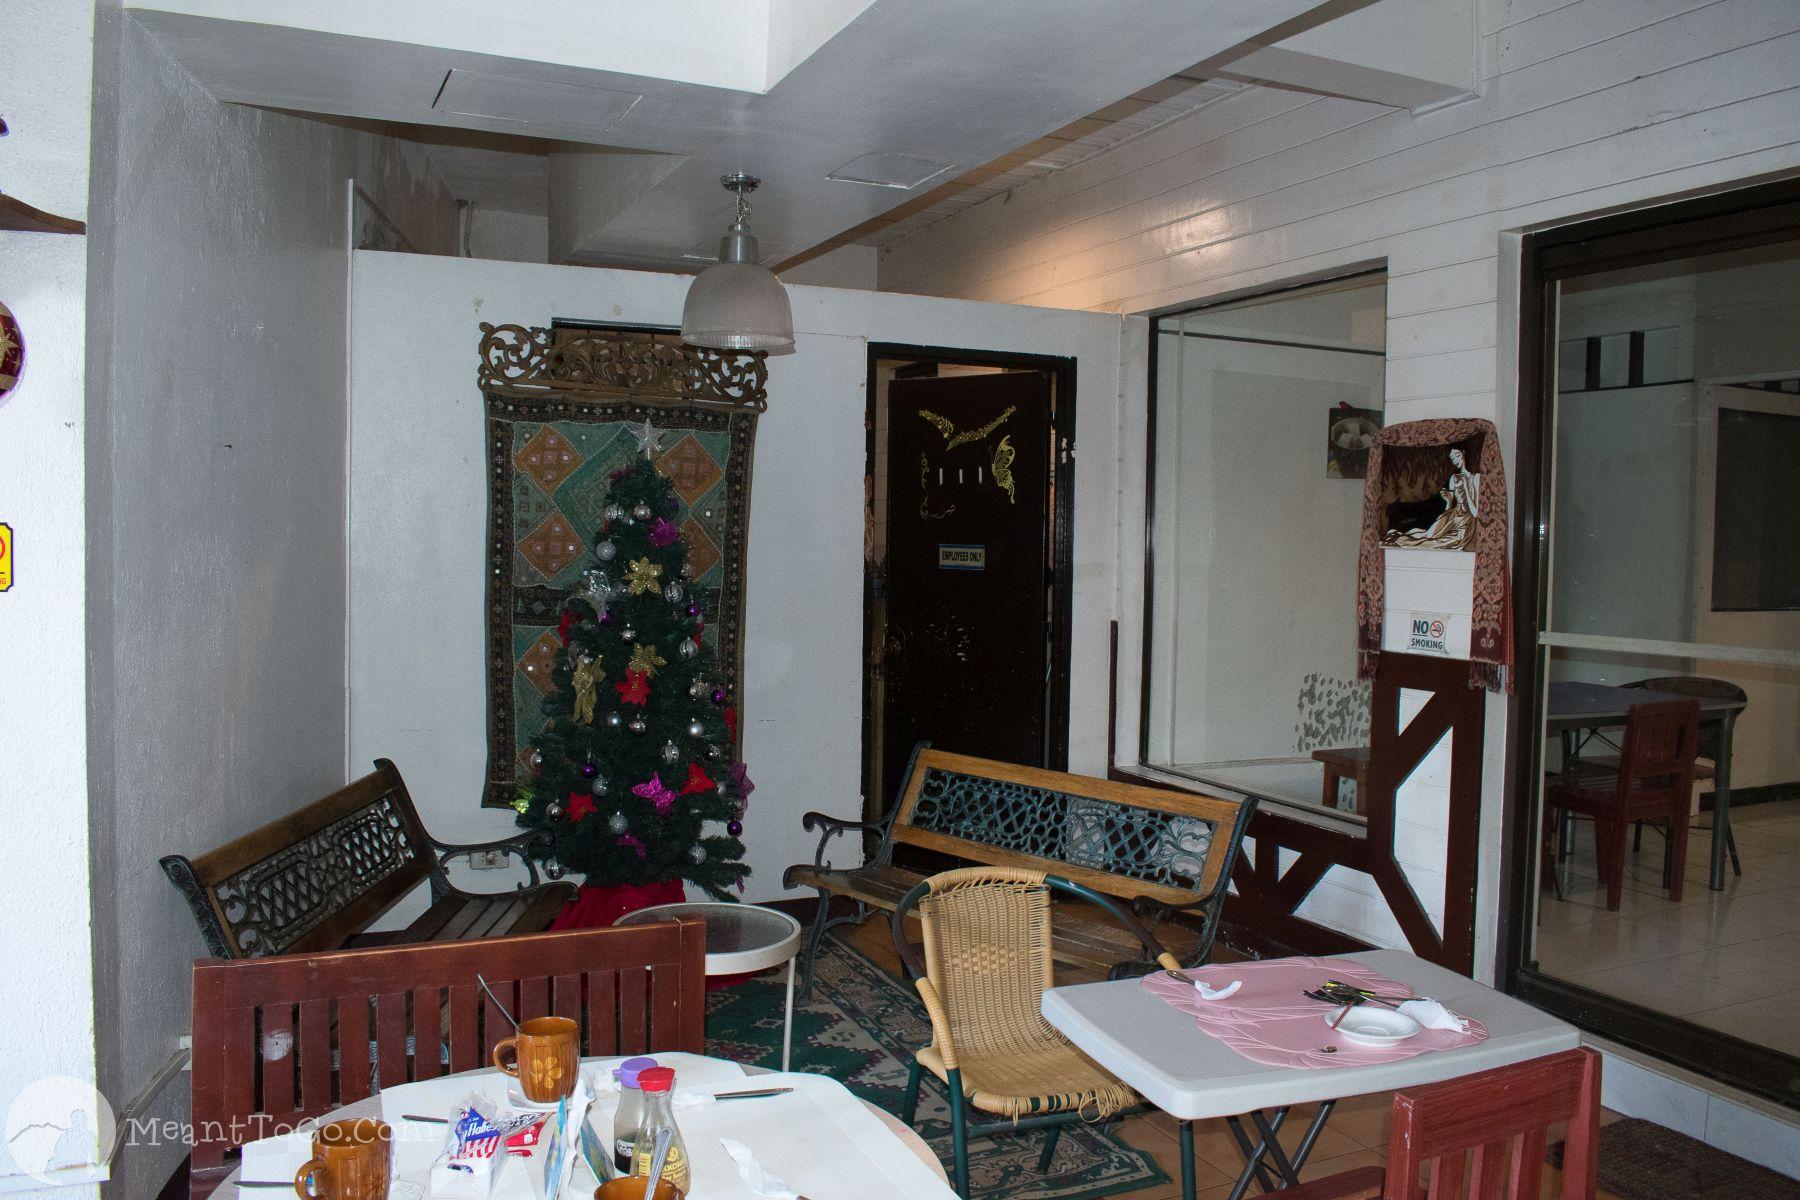 St. Nicolas Inn's dining area, Cagayan de Oro